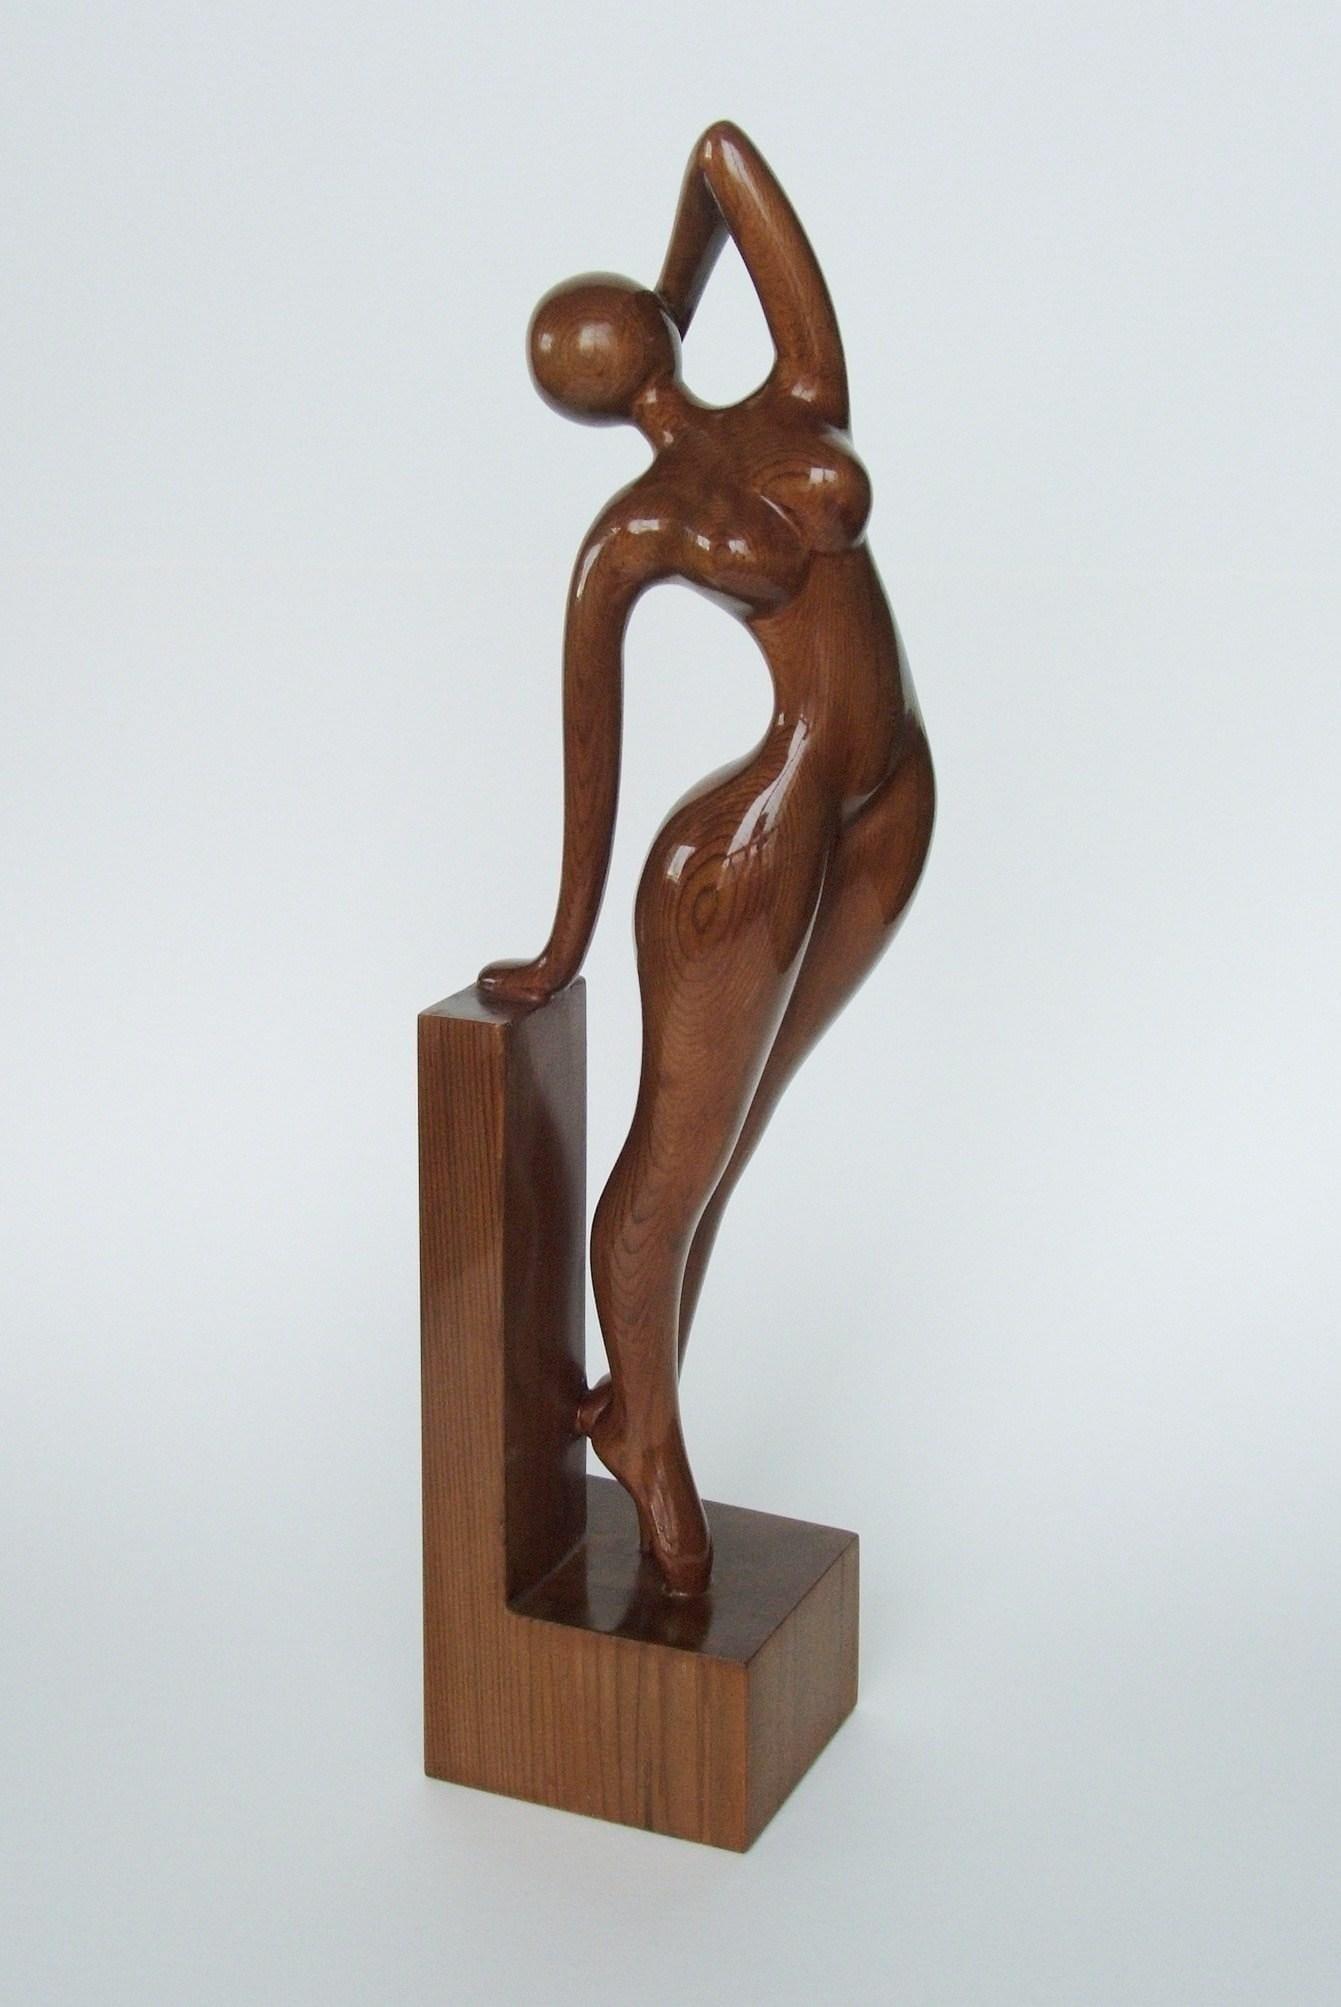 Nude woman wood sculpture AWAKENING | Etsy